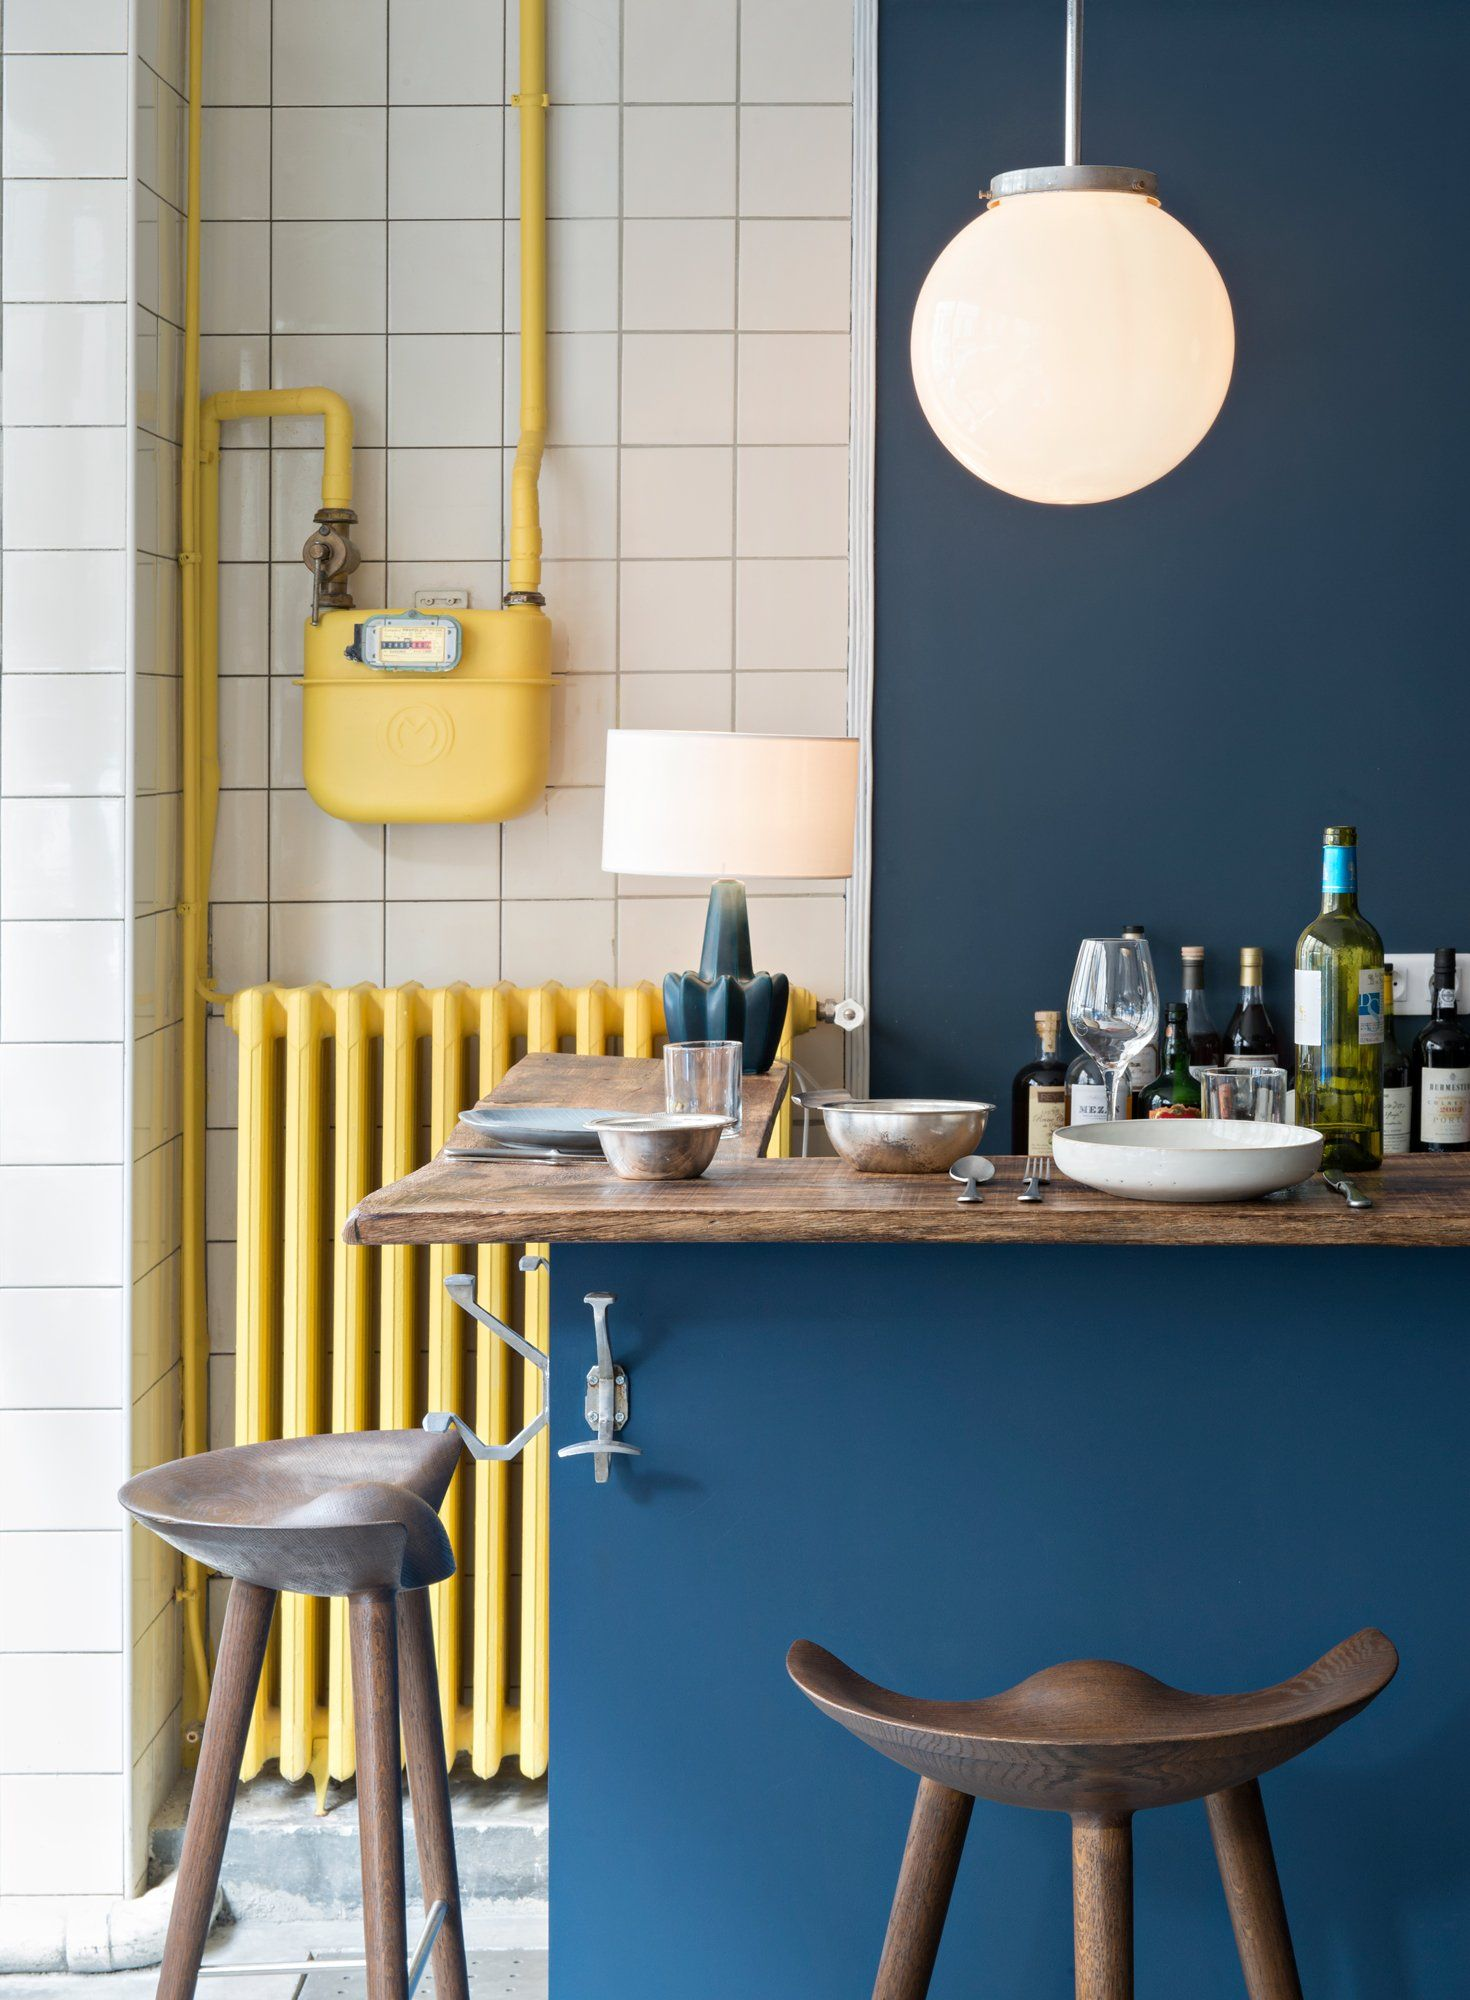 5 Ways to Decorate Your Kitchen Like a Cozy Parisian Café